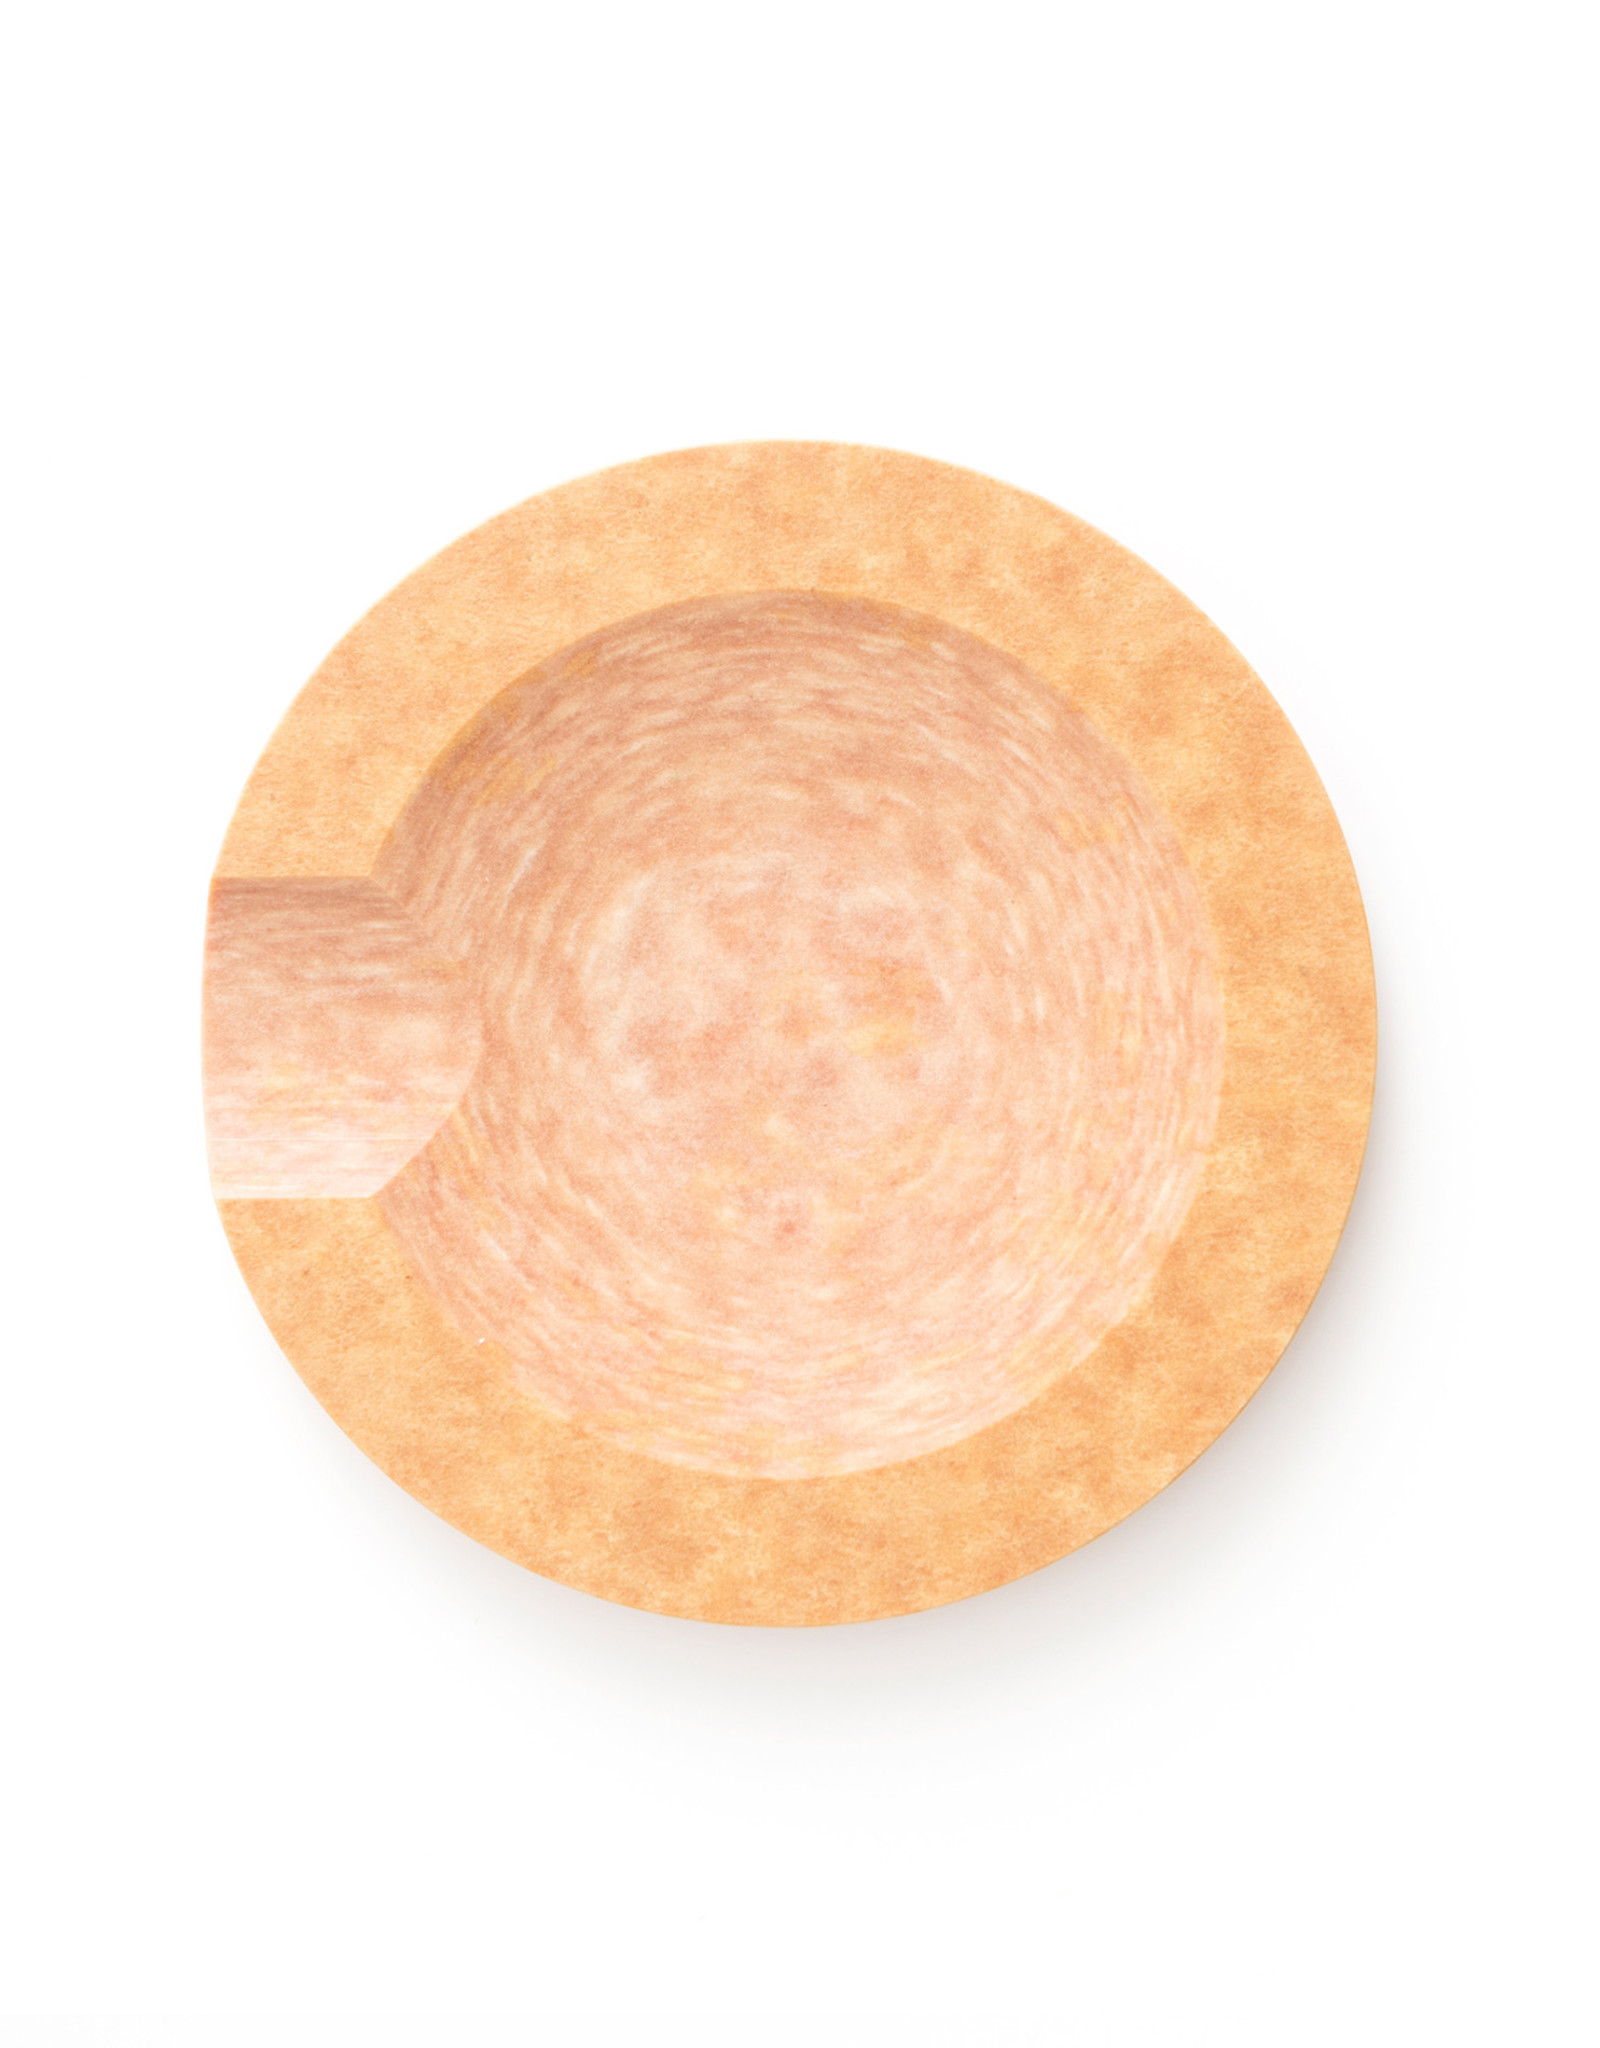 Epicurean Repose-cuillère Epicurean naturel